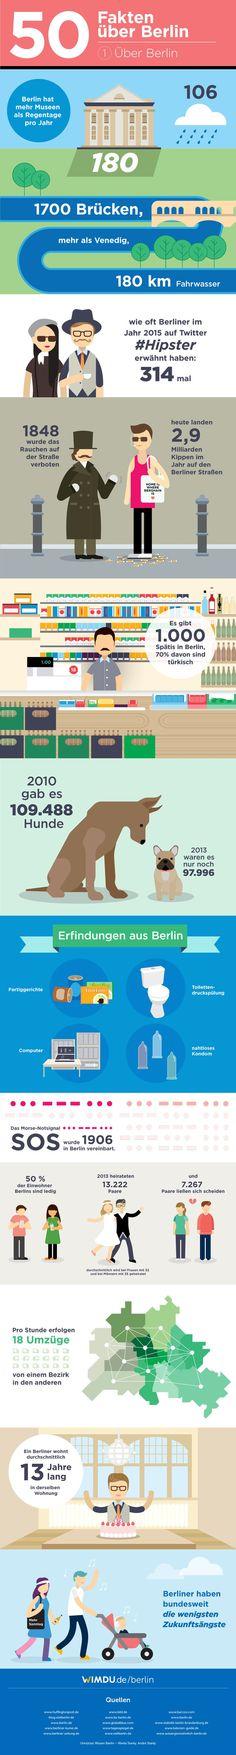 50 fakten über Berlin